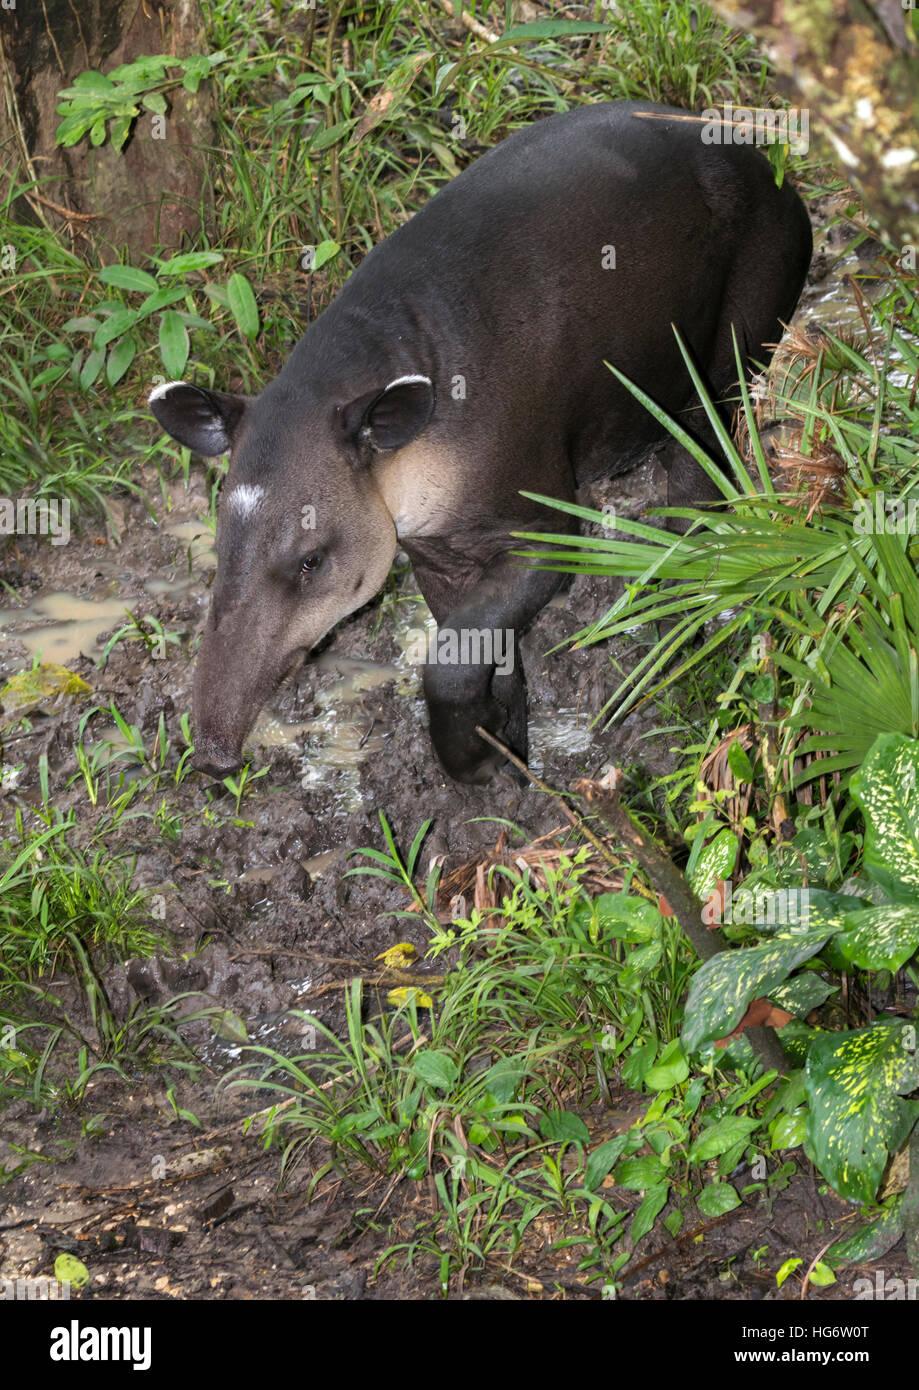 Baird's, or Central American, tapir (Tapirus bairdii) in swampy rainforest, Belize, Central America - Stock Image